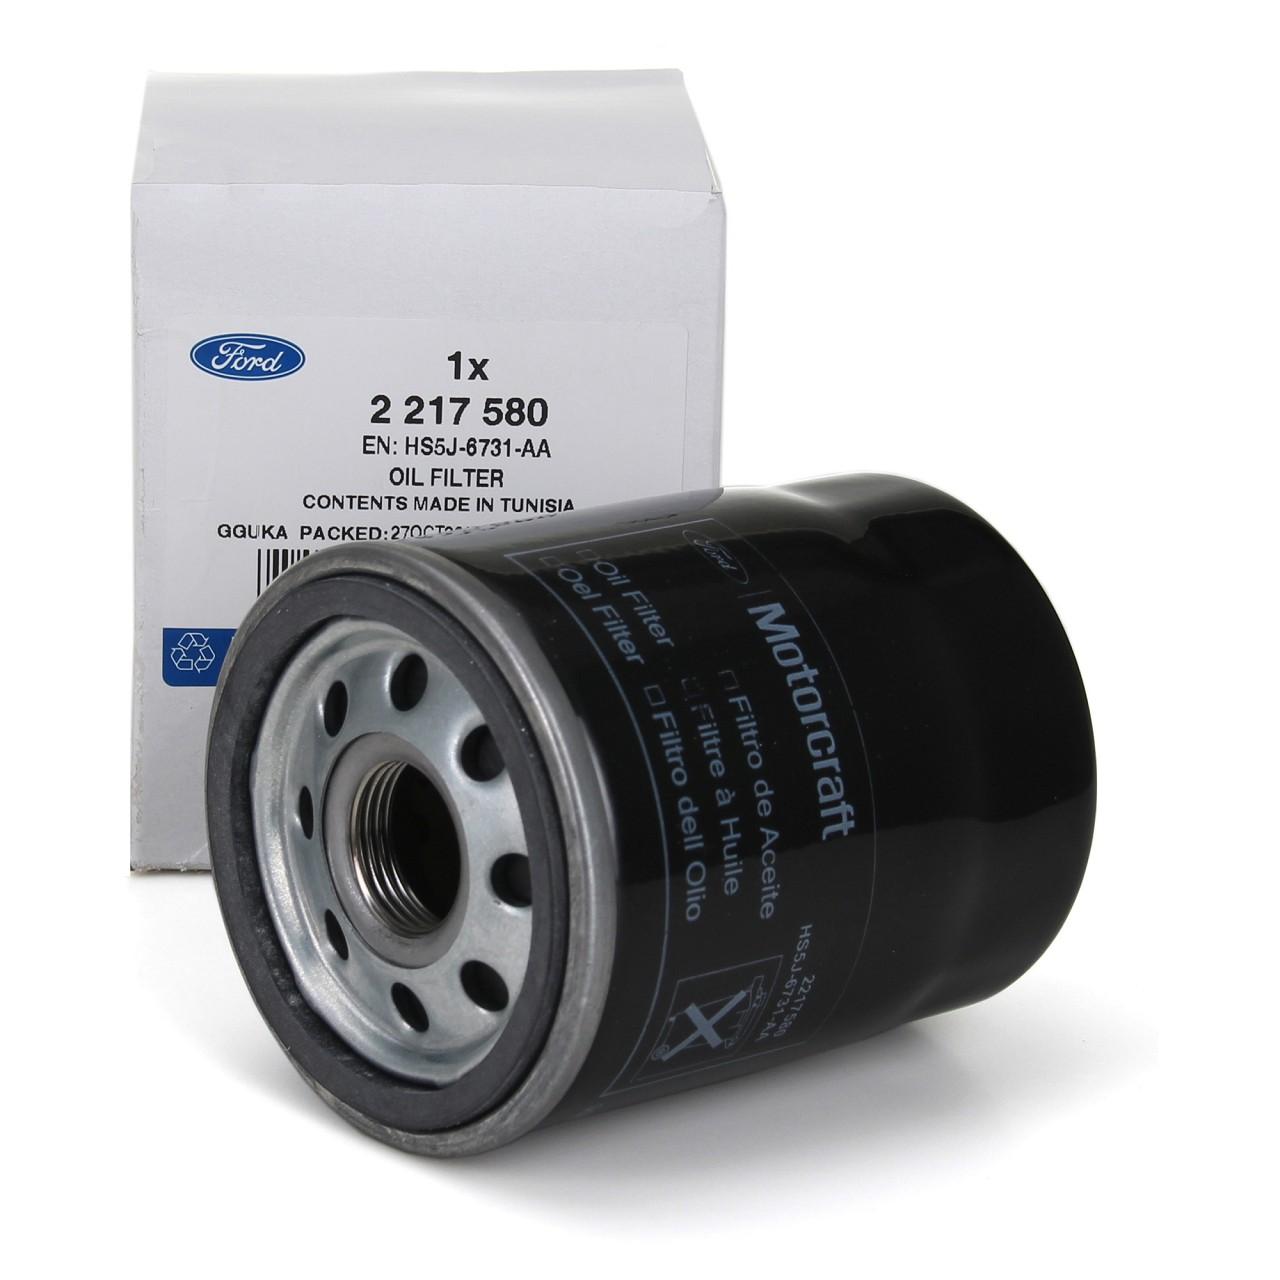 ORIGINAL Ford Ölfilter Motorölfilter Ka 1.2 69 PS Fiat 500 Panda Punto 1699522